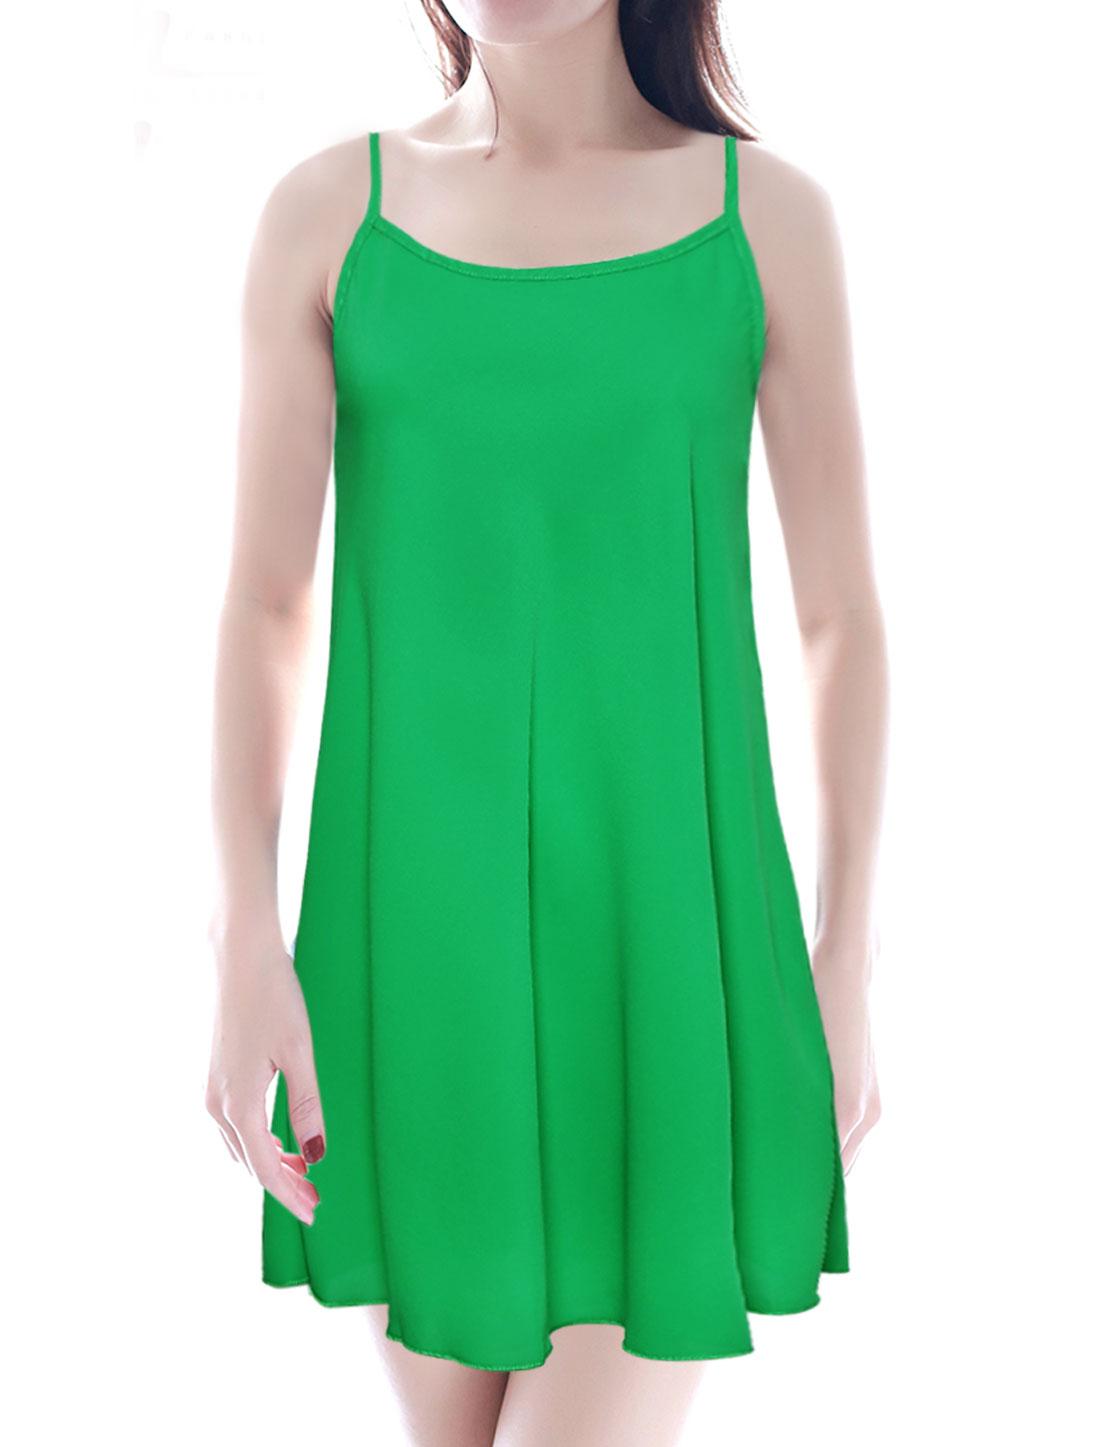 Ladies Spaghetti Strap U Neck Tunic Dress Green S